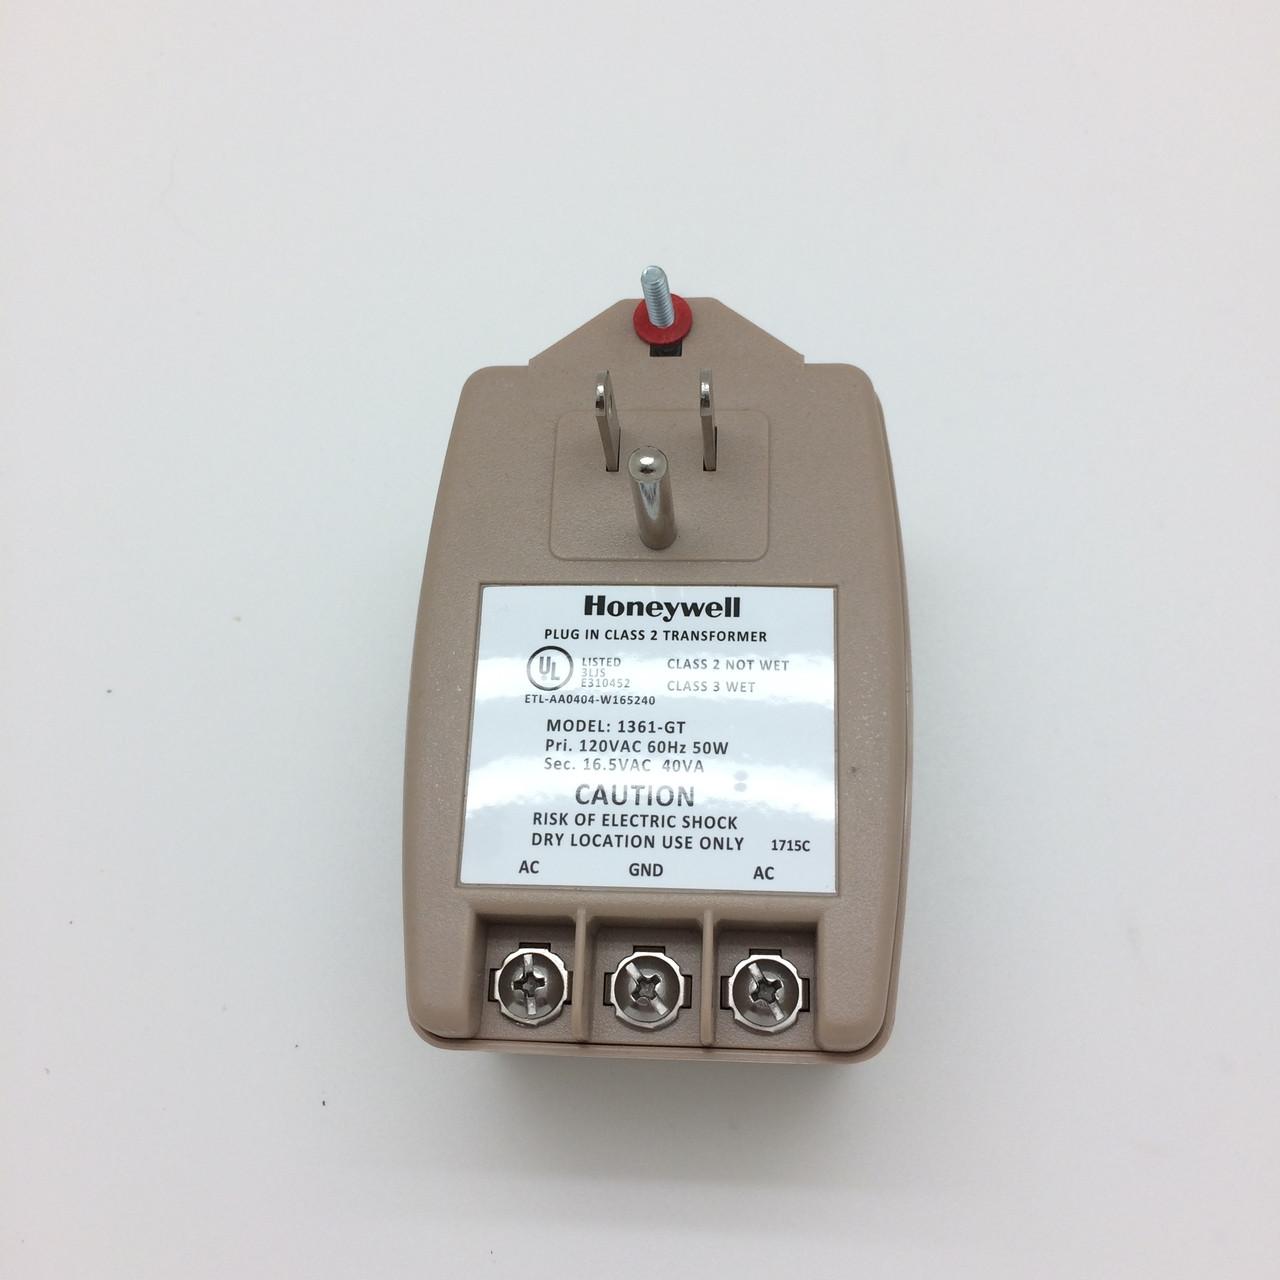 hight resolution of honeywell ademco 1361 gt transformer 16 5v 40va vista 20p control automation gt home a v distribution gt new house wiring